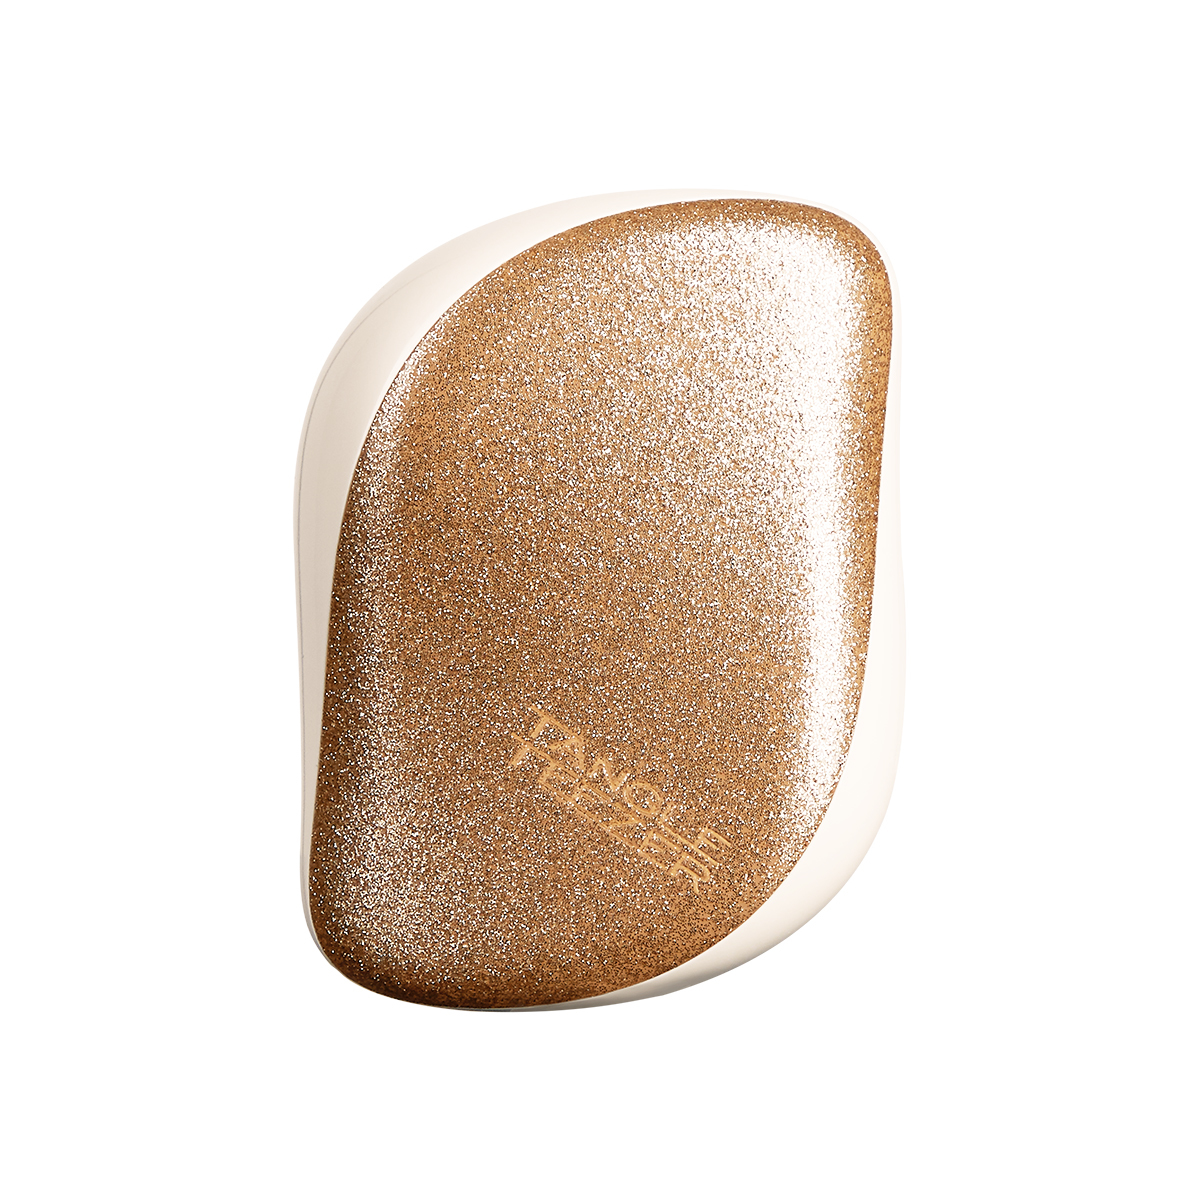 Расческа Tangle Teezer Compact Styler Gold Starlight